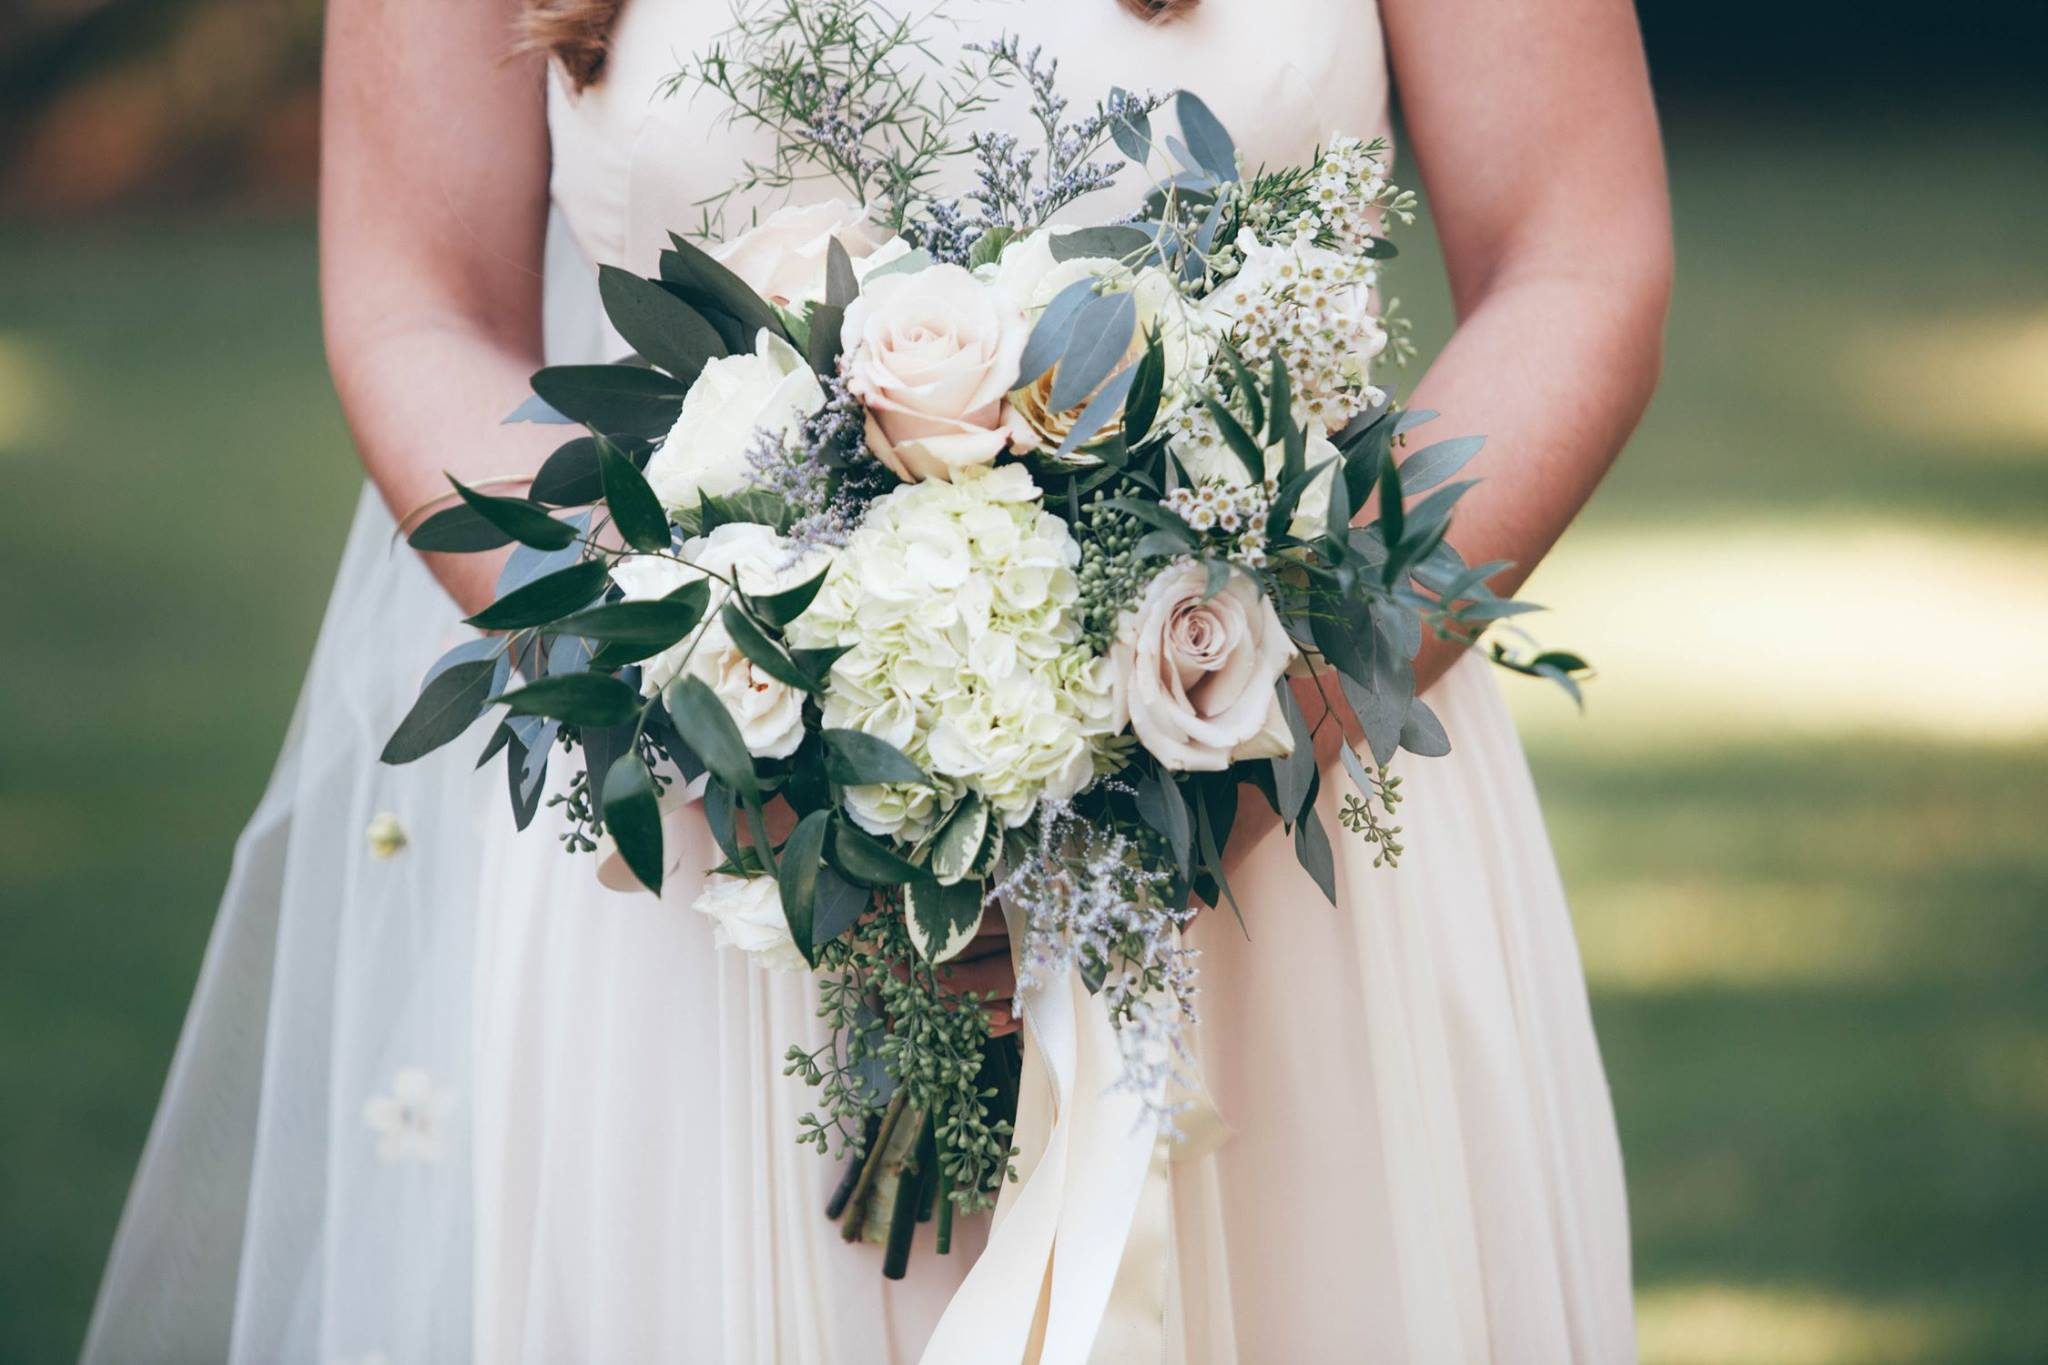 lindy-garvin-rebecca-schoneveld-vivian-sage-blush-wedding-dress-blush-bridal-gown-handmade-wedding-dress-ivory-and-beau-bridal-boutique-savannah-wedding-dresses-savannah-bridal-boutique-savannah-weddings-savannah-brides-jacksonville-bridal-boutique-5.jpg